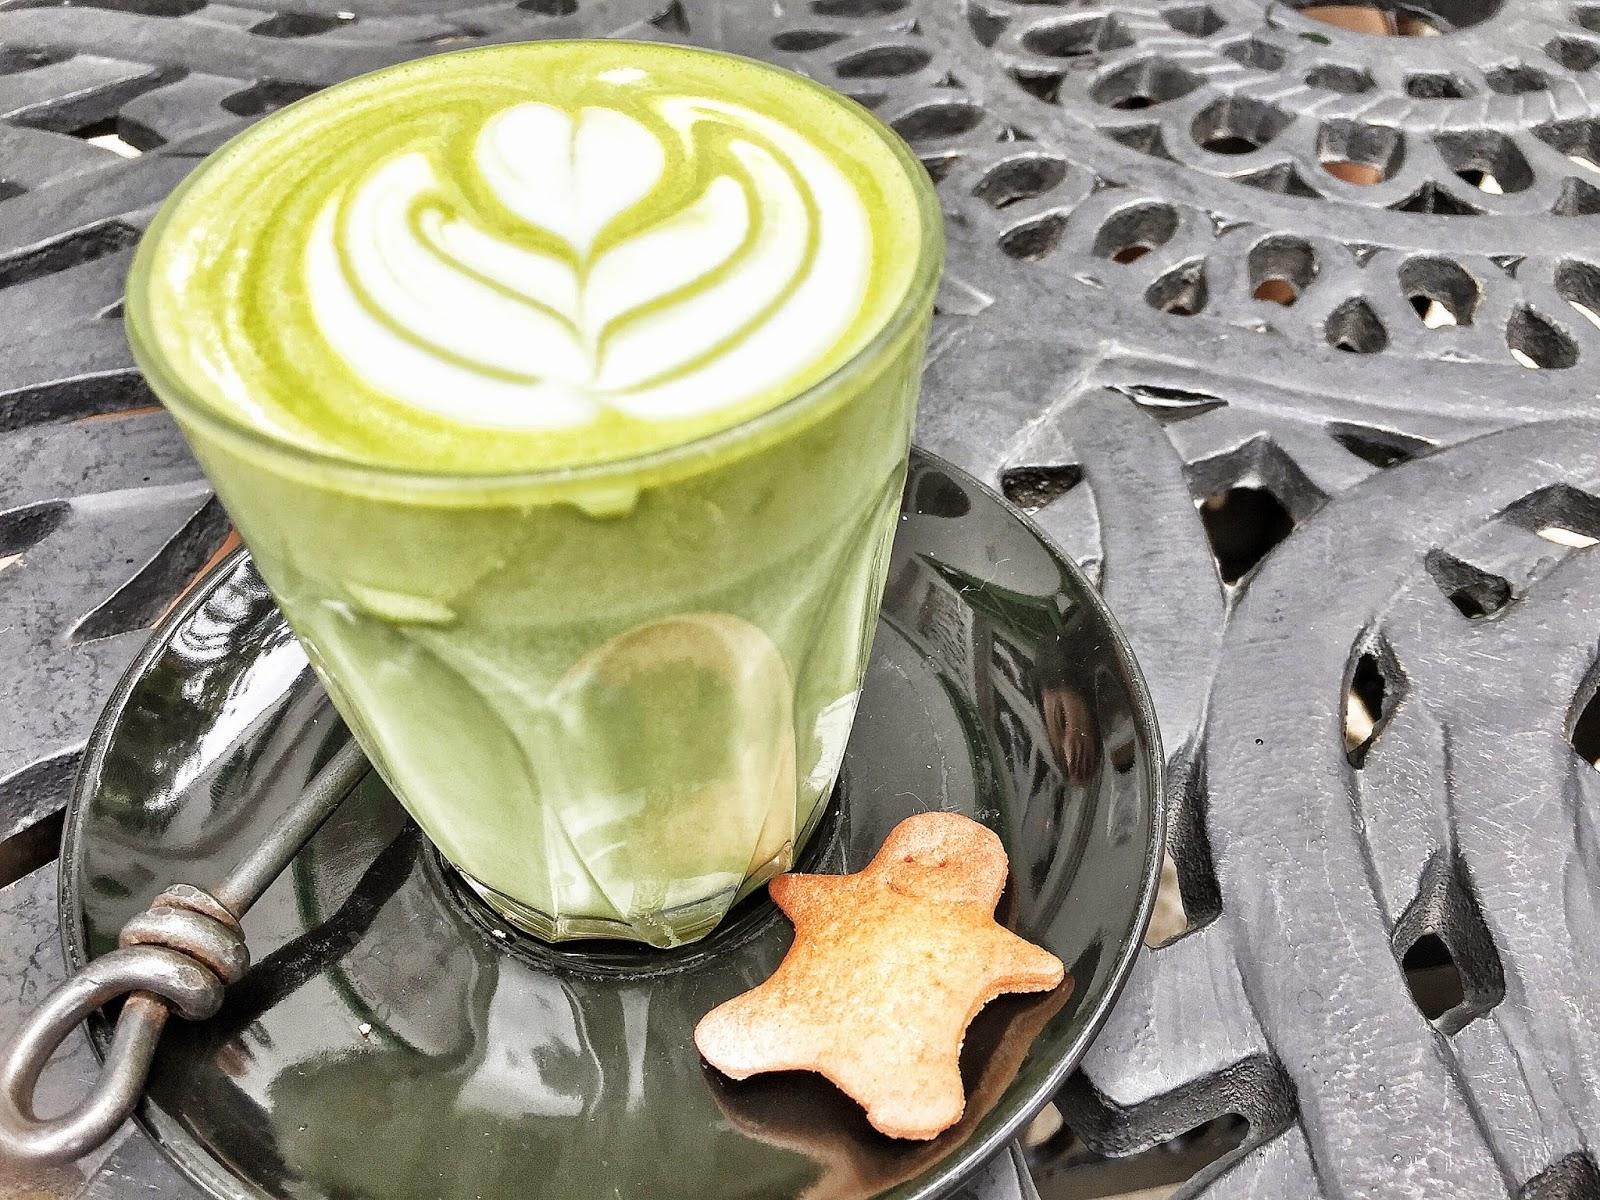 Symmetry Cafe - Green Tea Latte